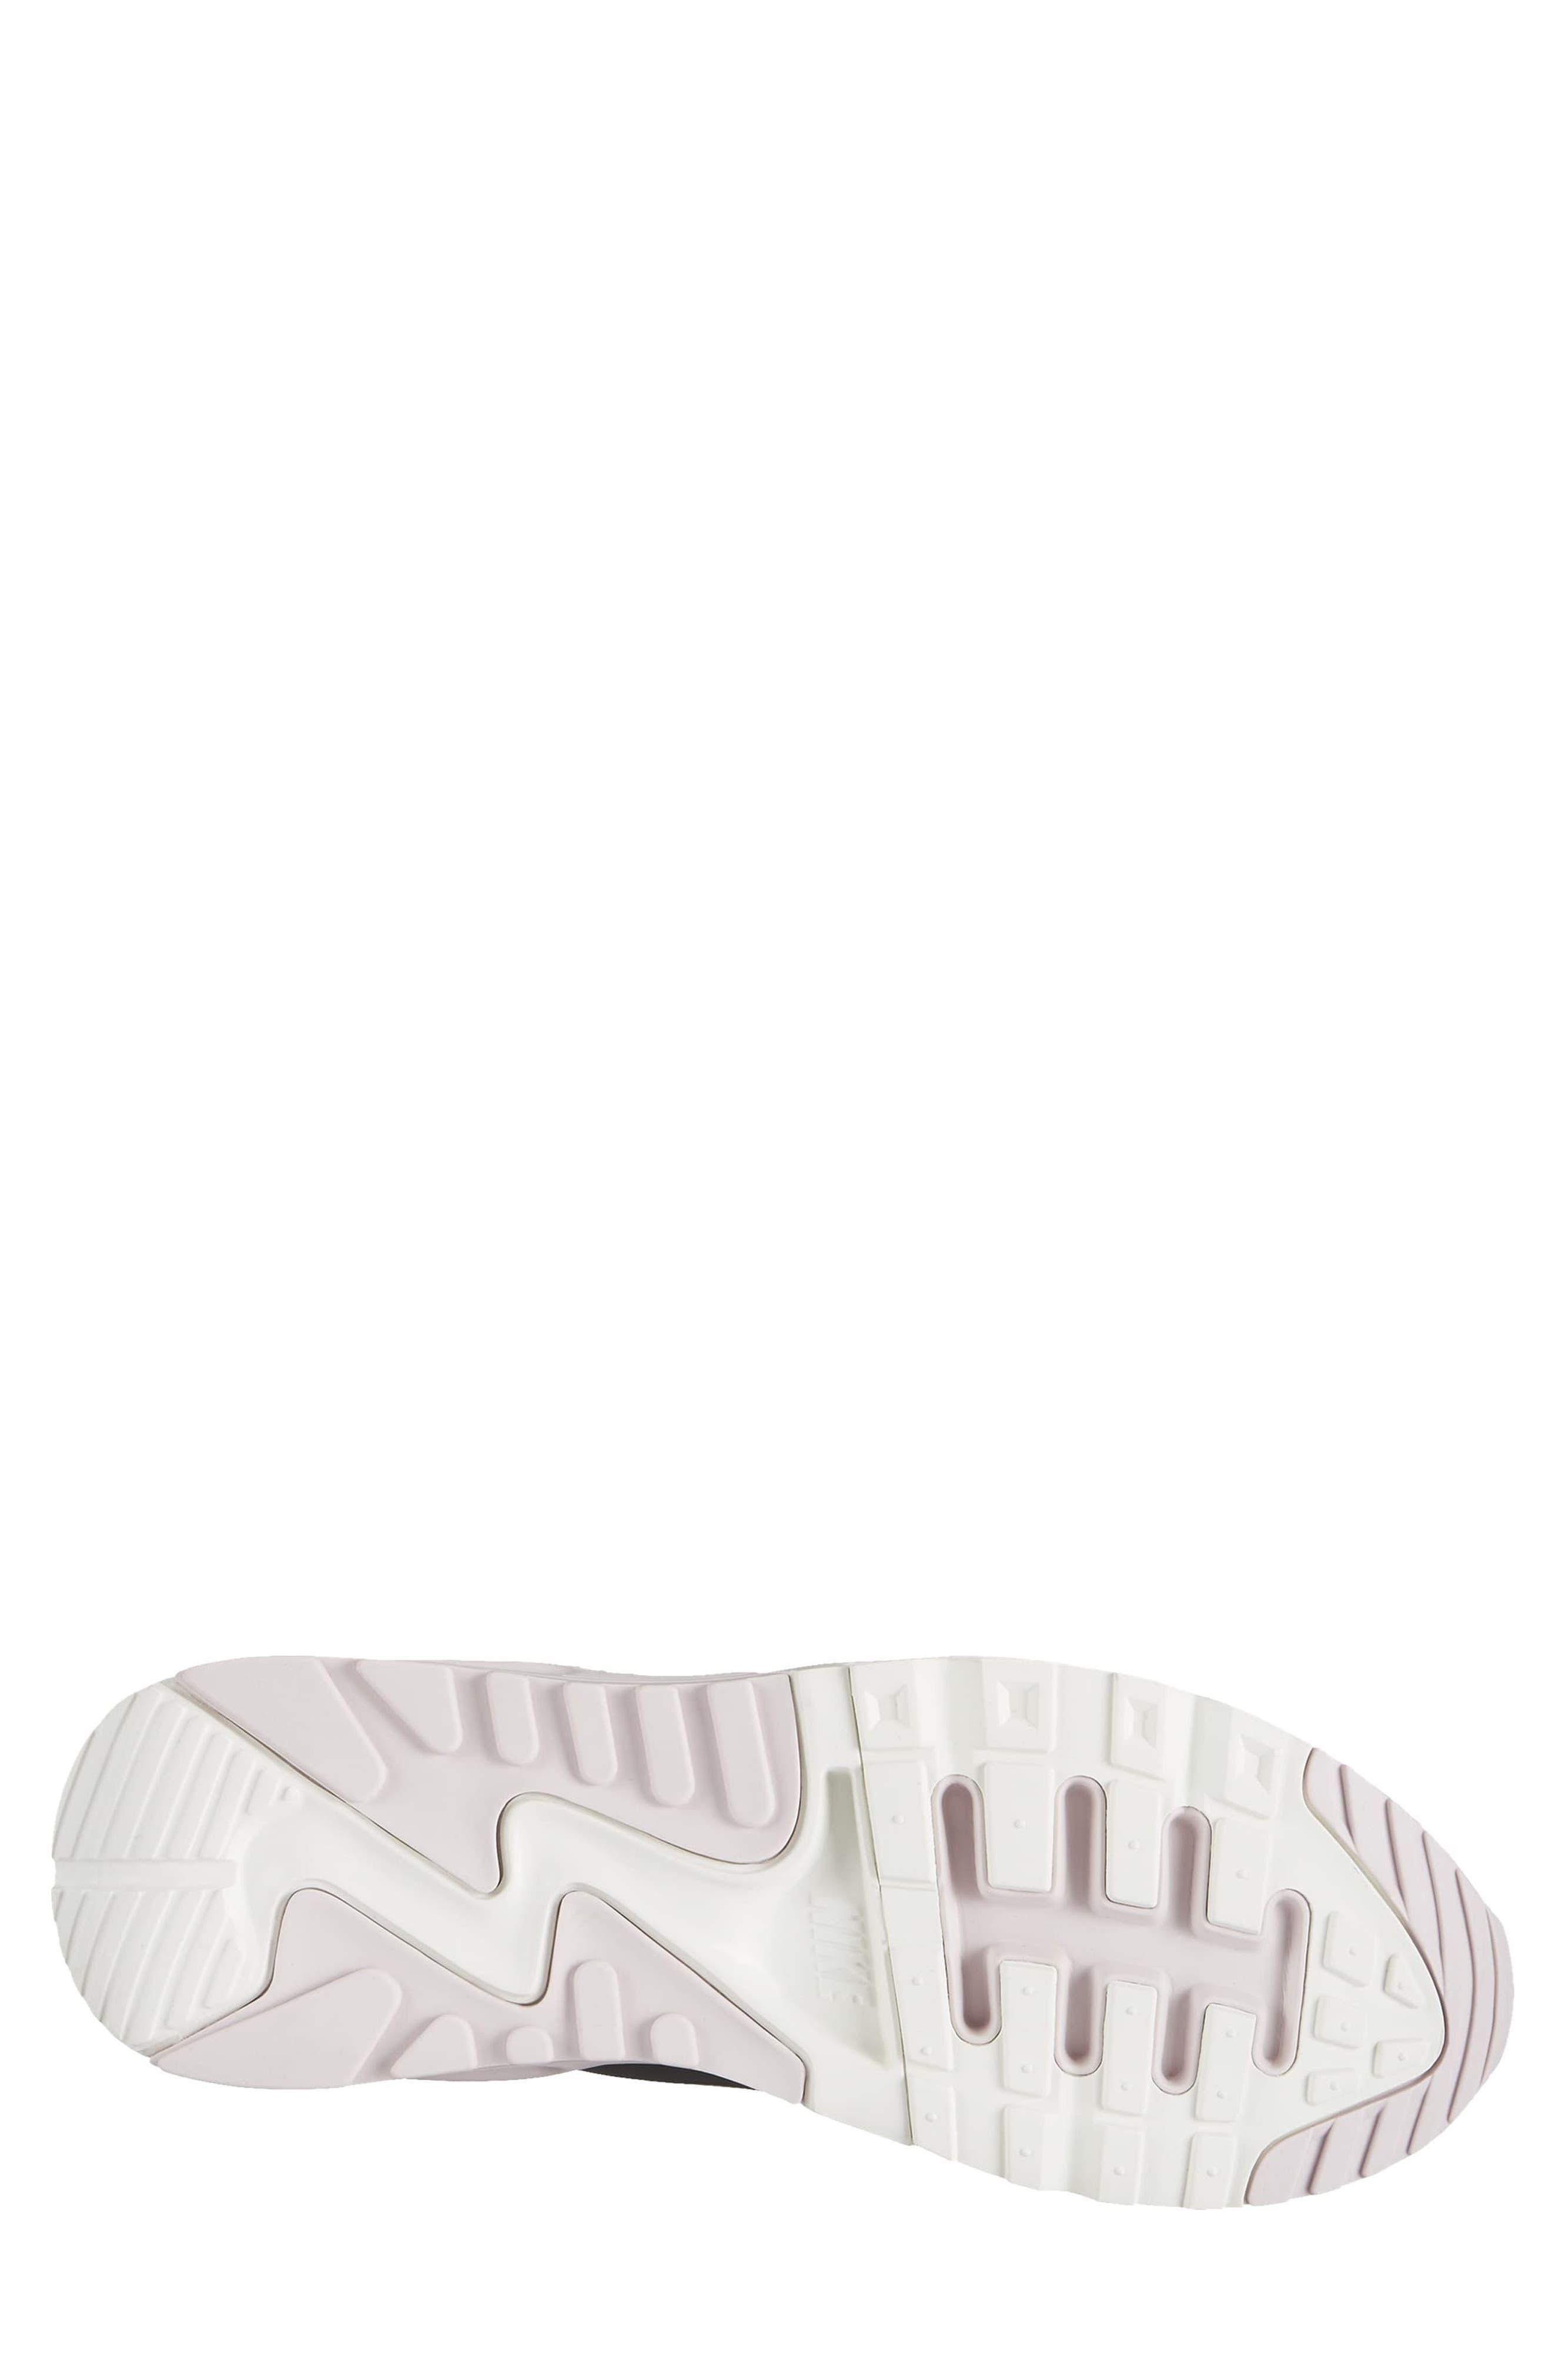 Air Max 90 Flyknit Ultra 2.0 Sneaker,                             Alternate thumbnail 14, color,